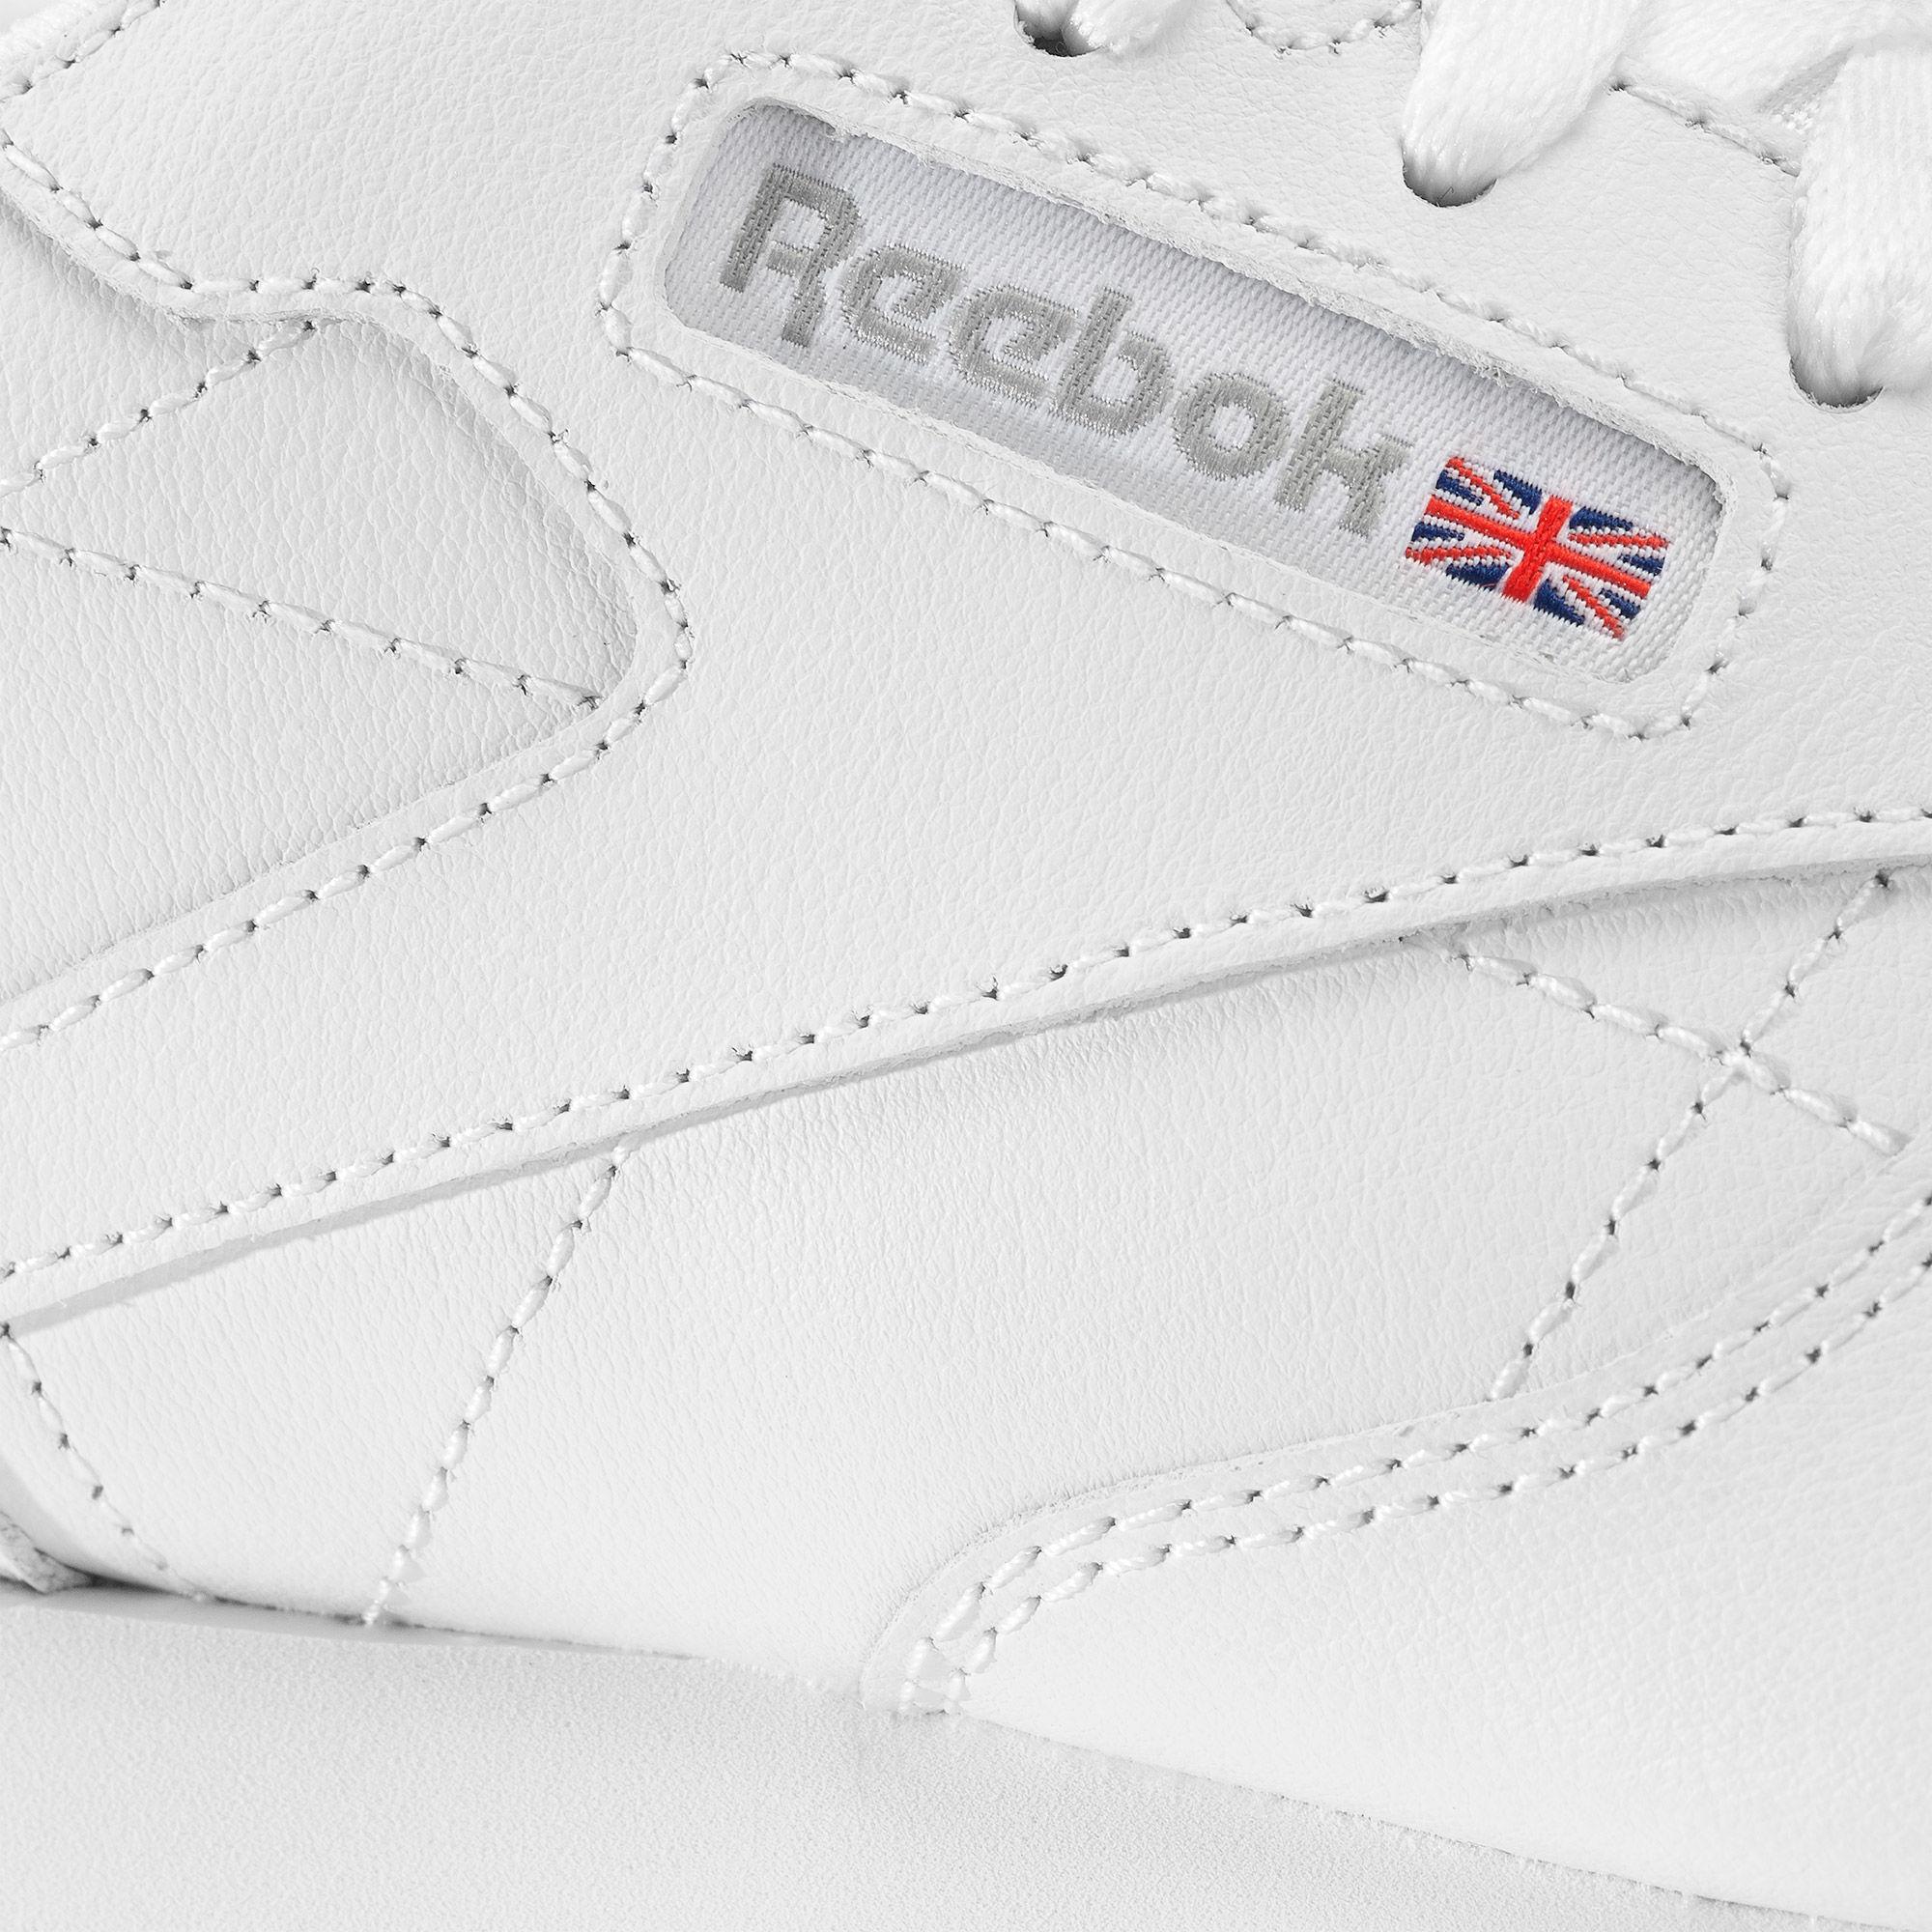 Classic Leather Reebok buty 50151 r37 ^6 białe 7098201197